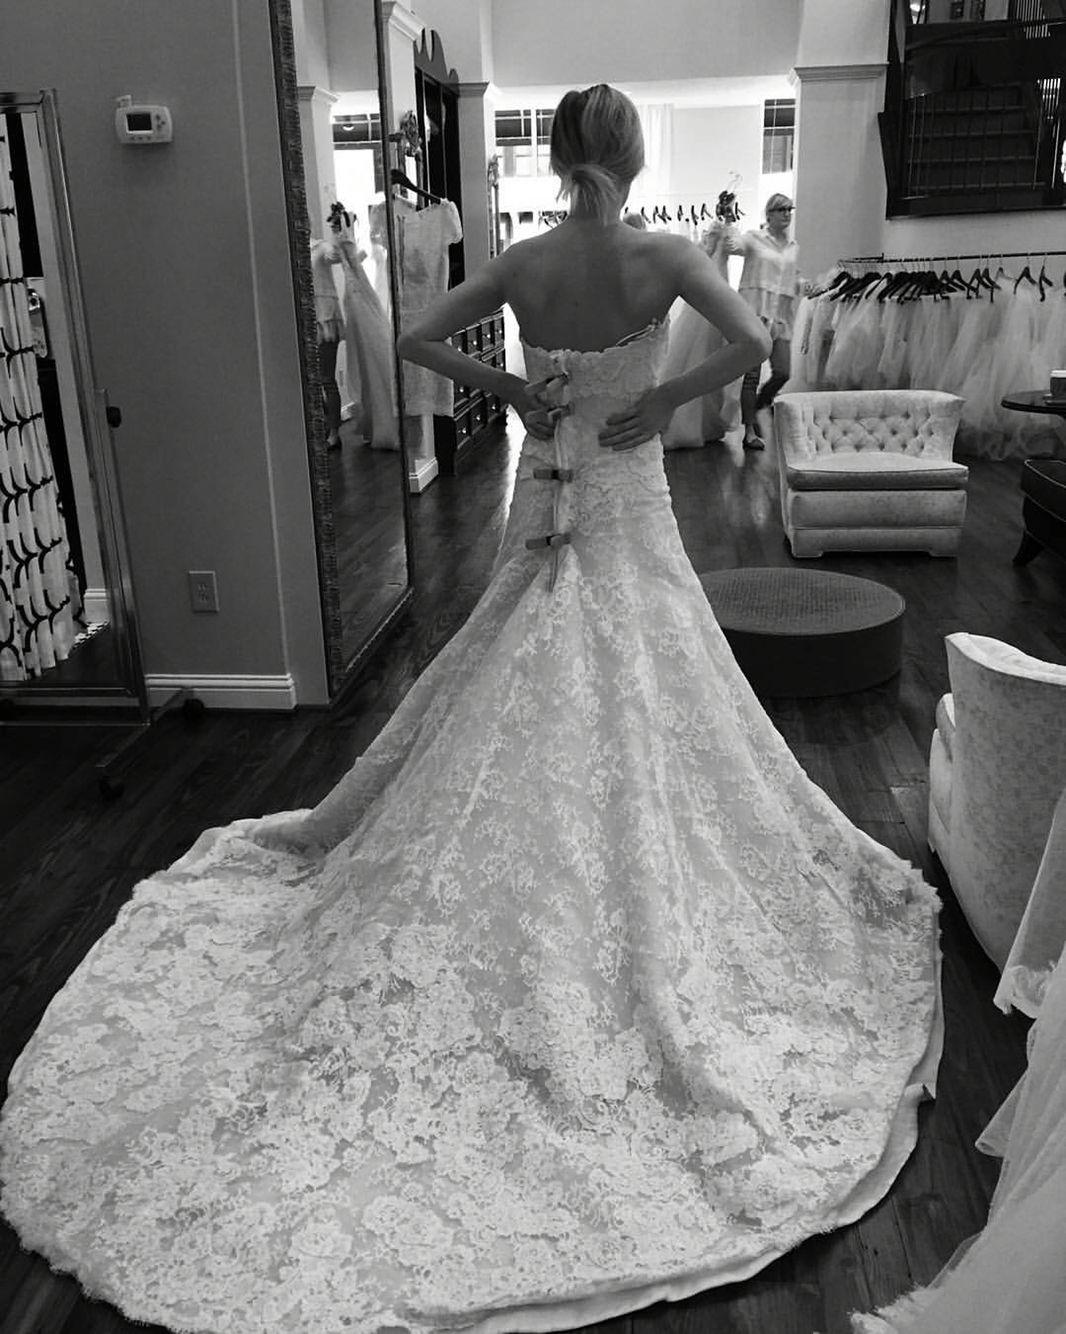 Nastia Liukin Wedding.Nastia Liukin Trying On Wedding Dresses Soexcited